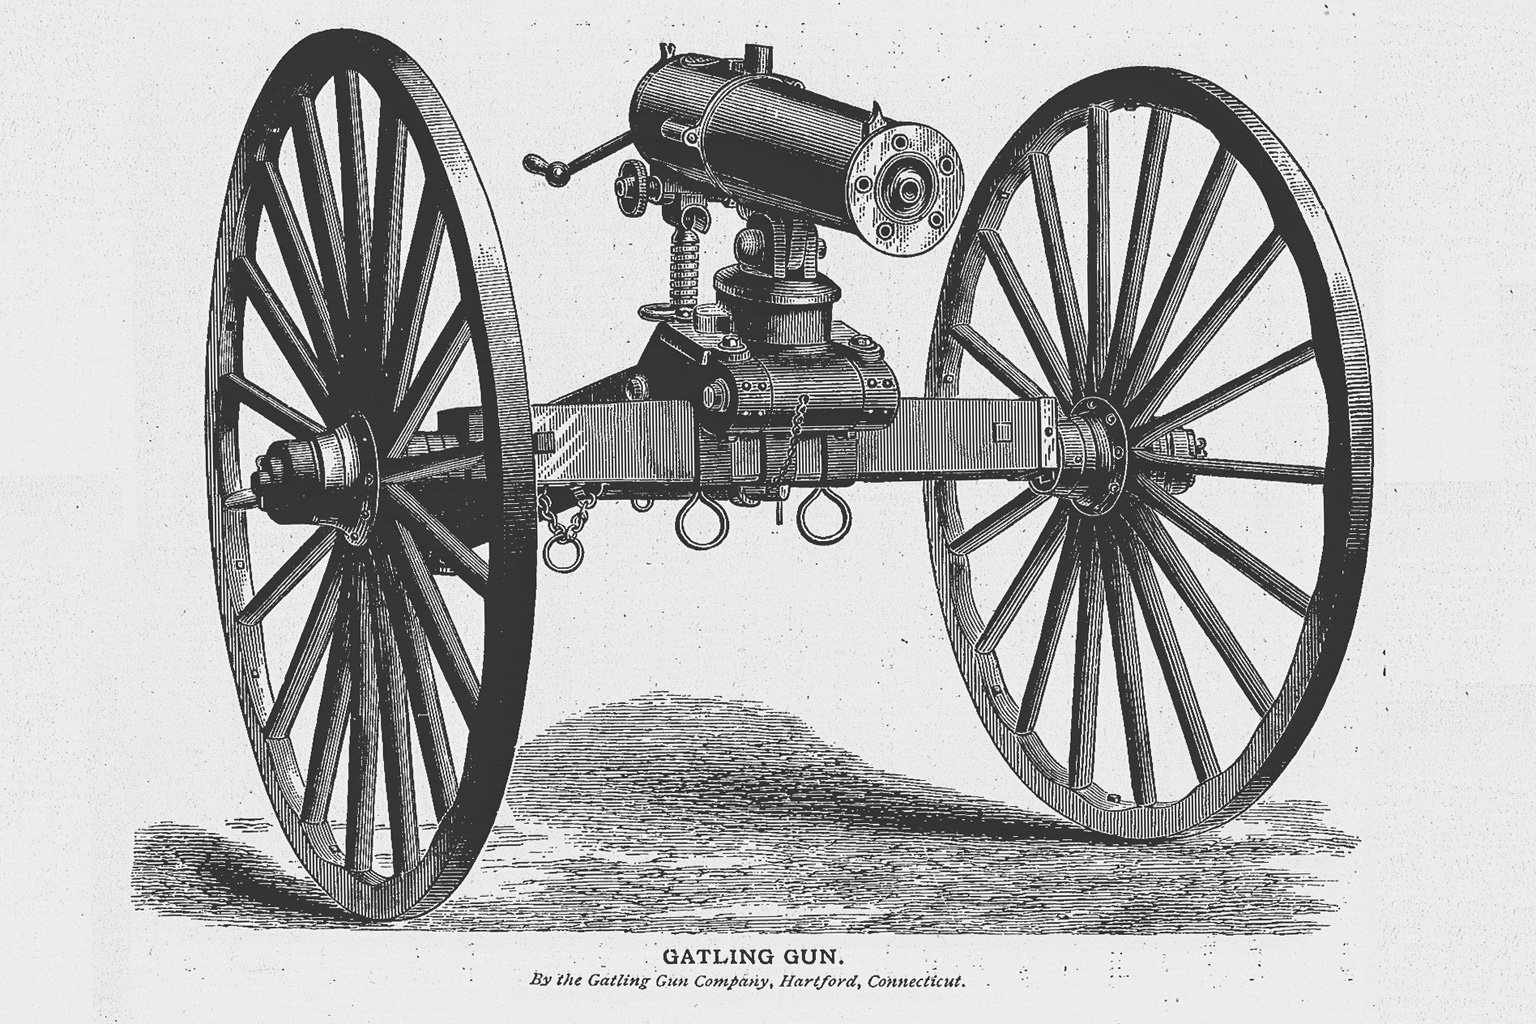 La fabuleuse histoire de la Gatling 799l